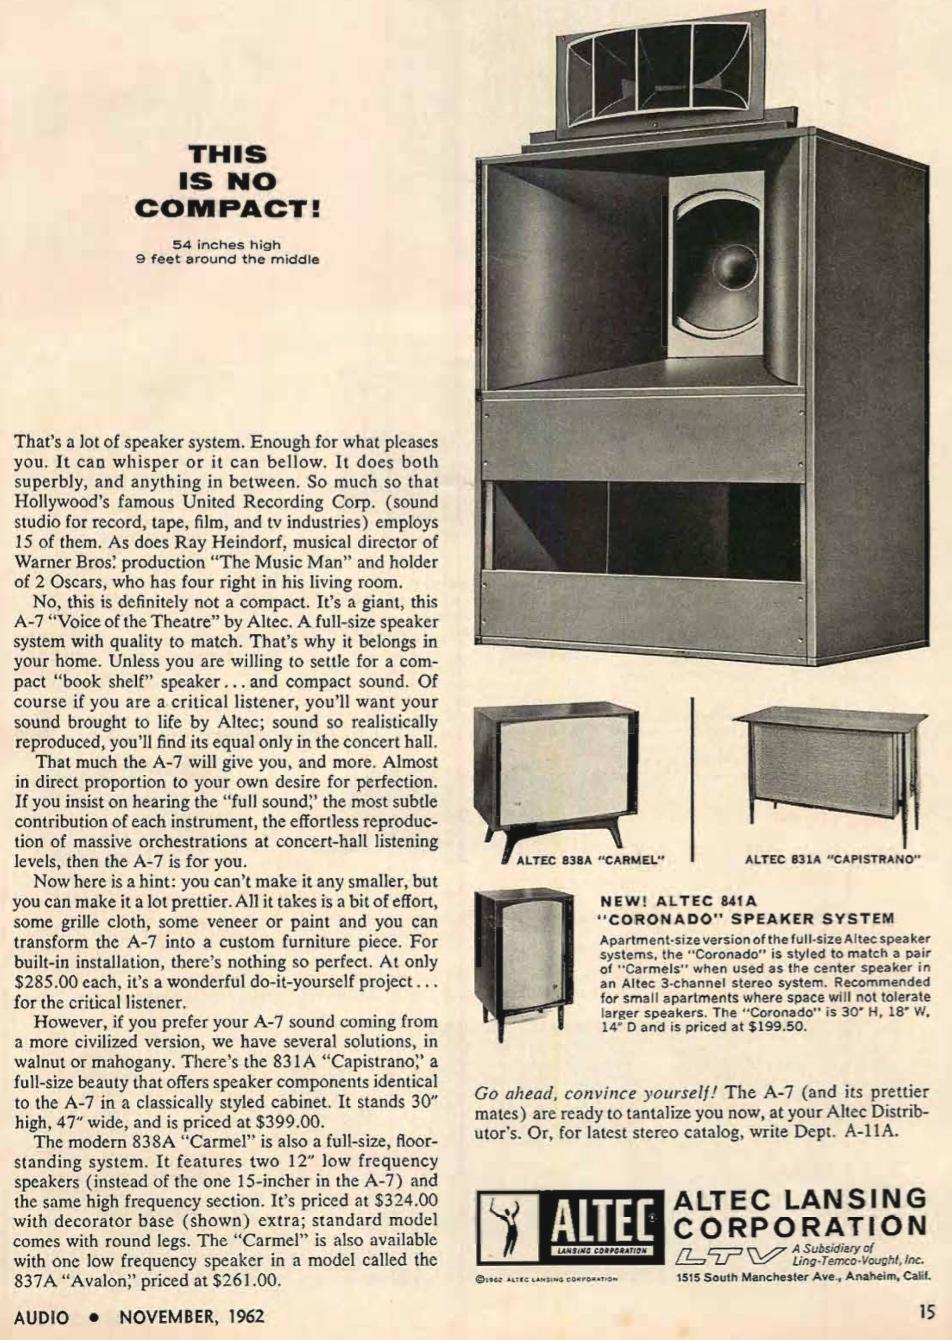 retro vintage modern hi-fi: Altec